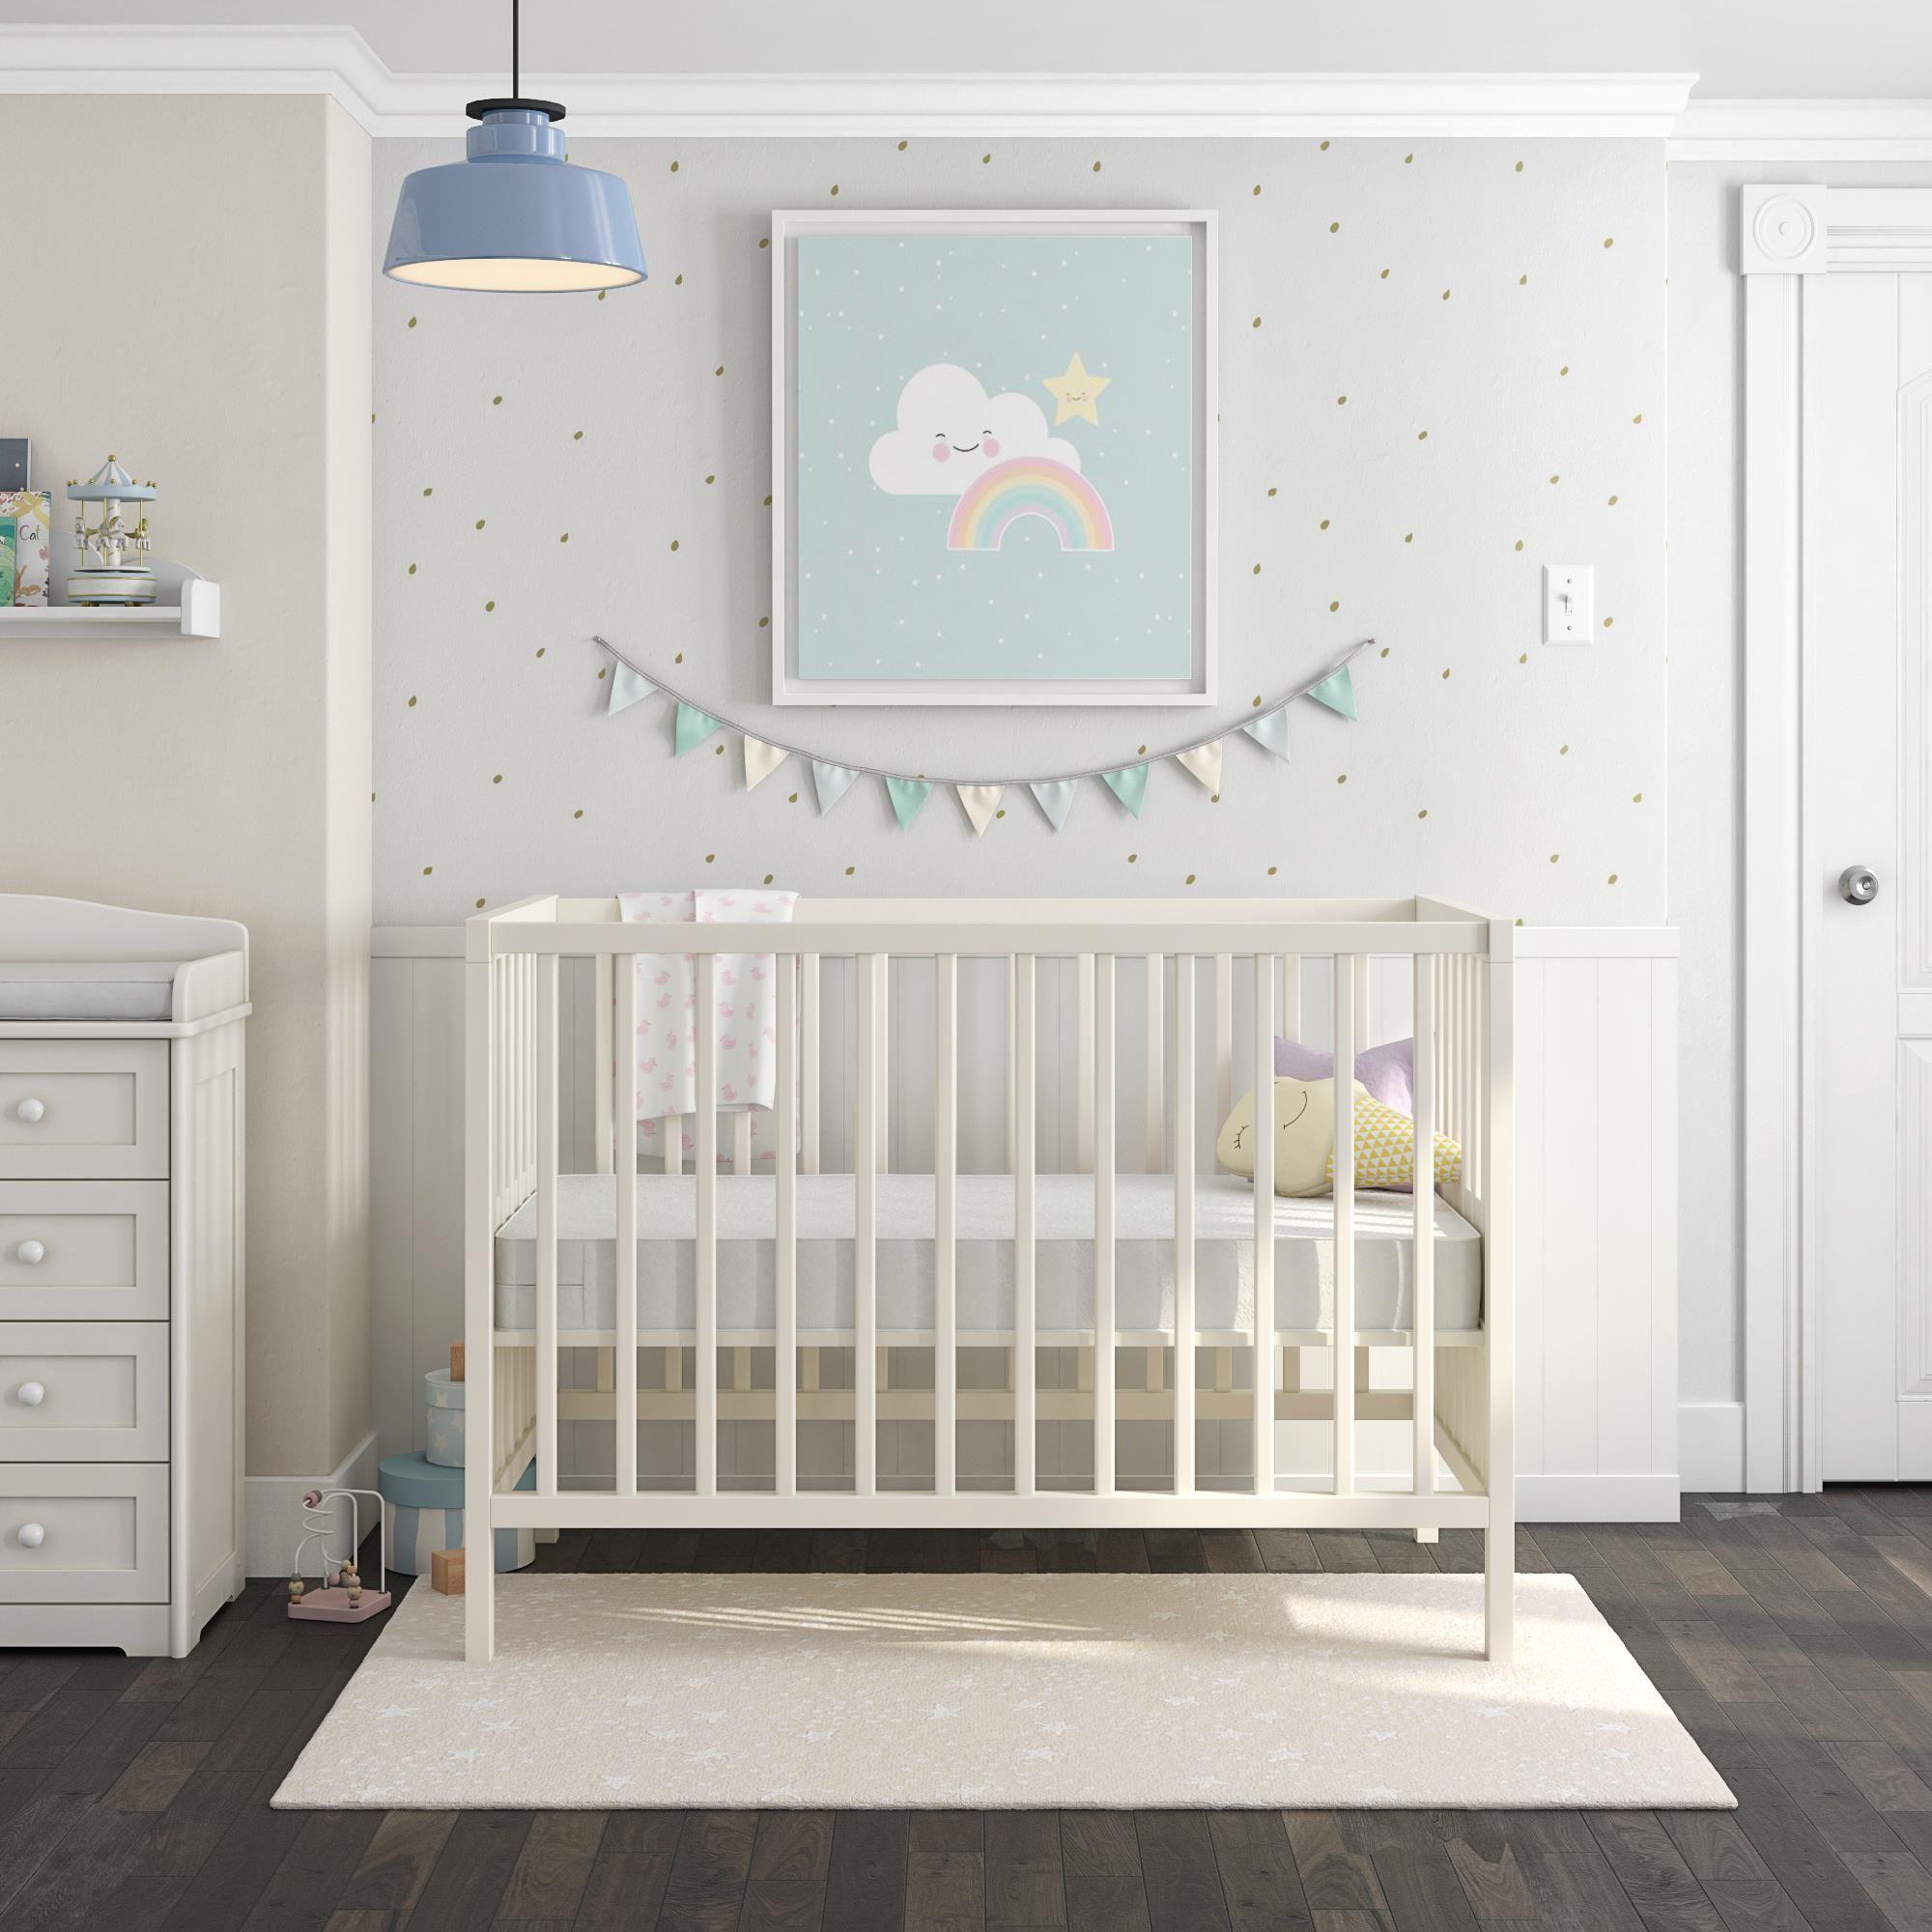 45 Reference Of Baby Crib Mattress Standard Size In 2020 Baby Crib Mattress Best Baby Cribs Baby Cribs